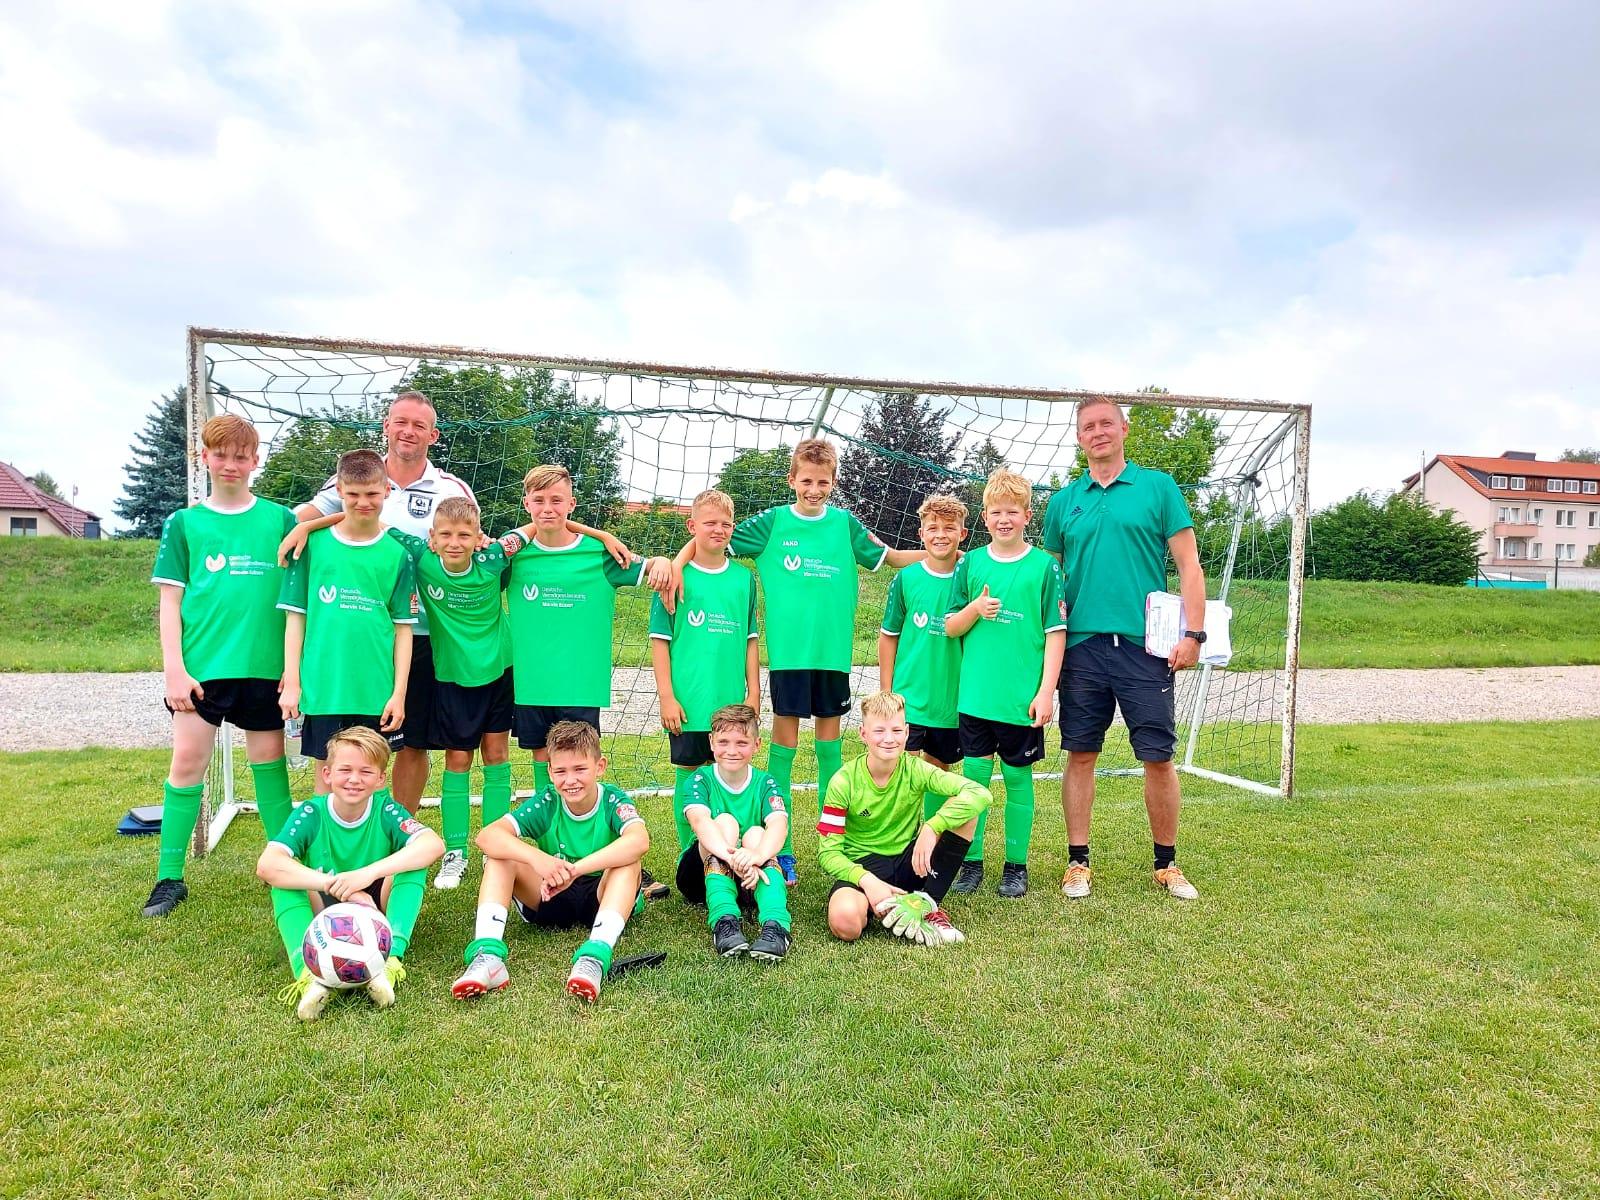 Fußballturnier Wanderpokal in Heudeber D-Jugend Jahrgang 2008/2009.